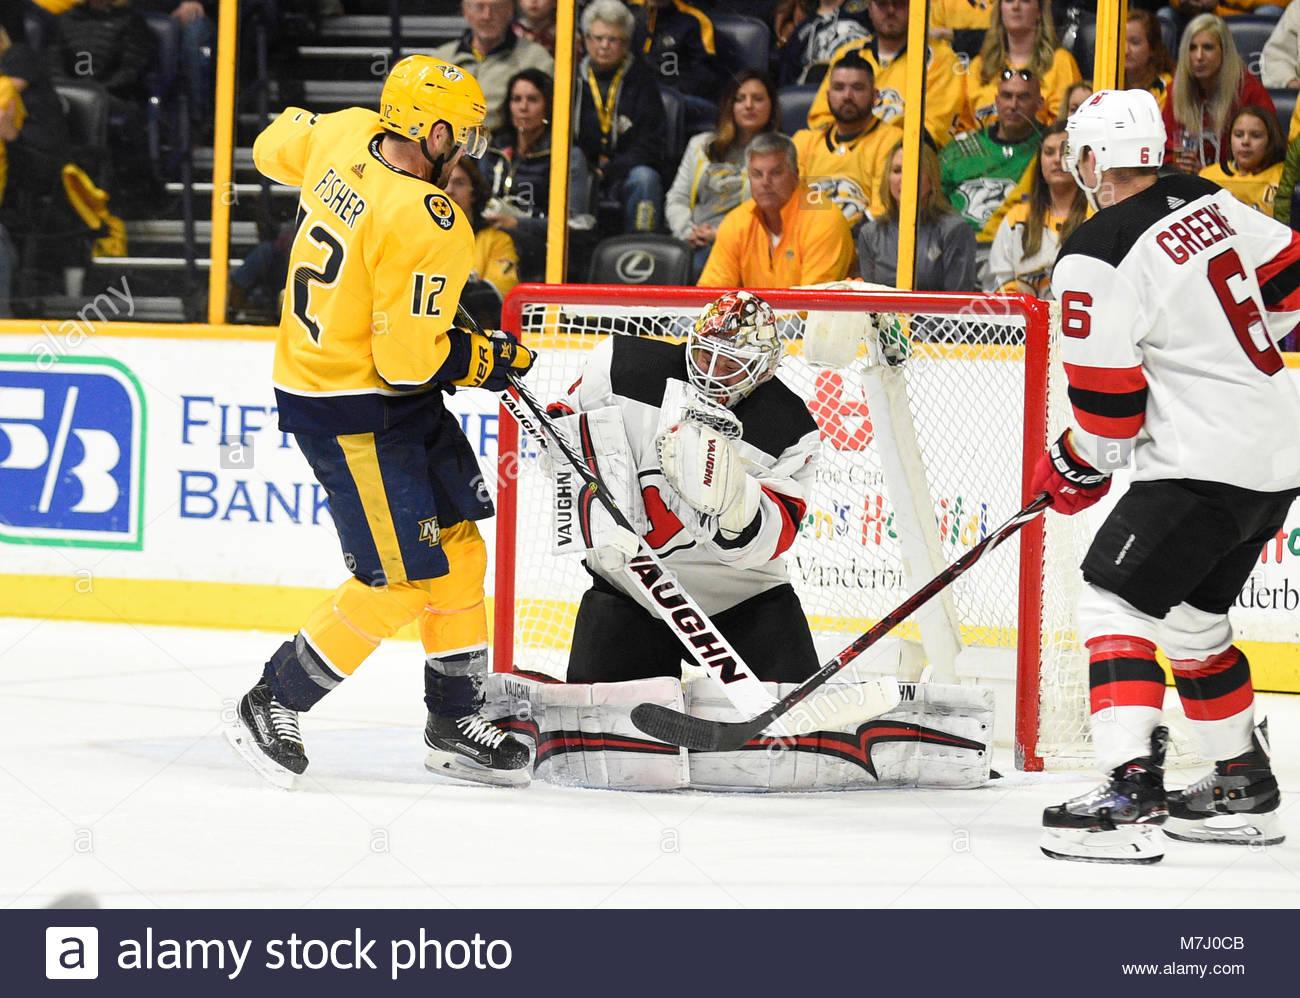 Bridgestone Arena. 10th Mar, 2018. USA Nashville Predators center Mike Fisher (12) has his shot blocked by New Jersey - Stock Image